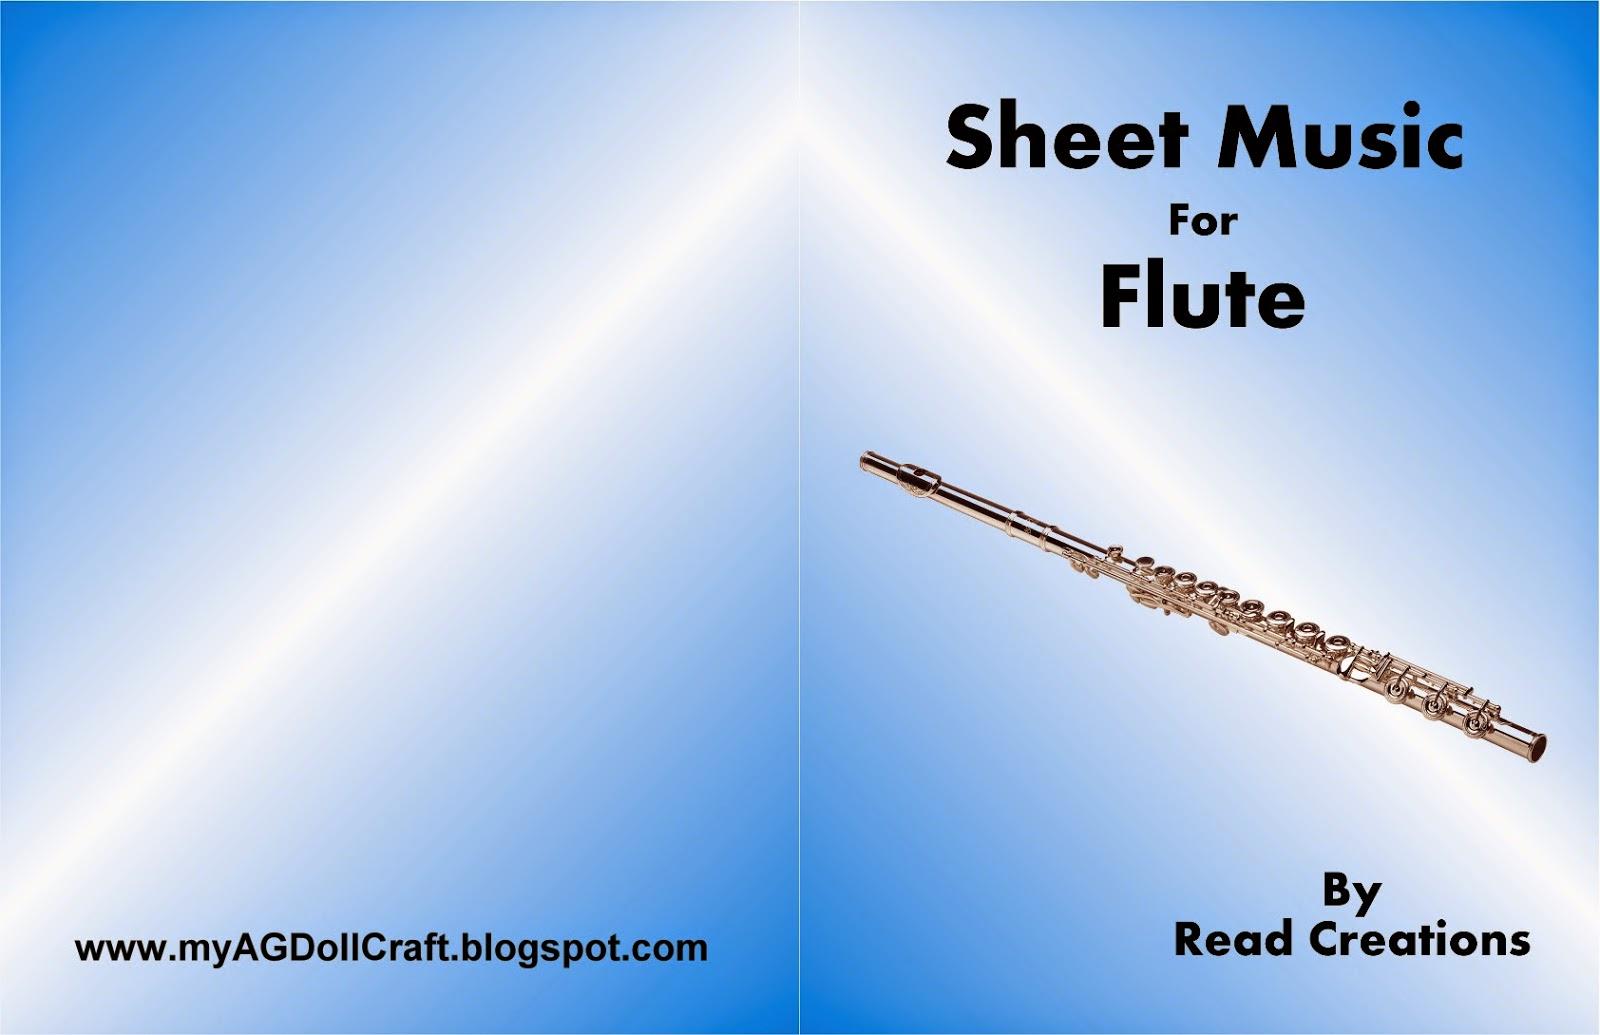 Flute book cover